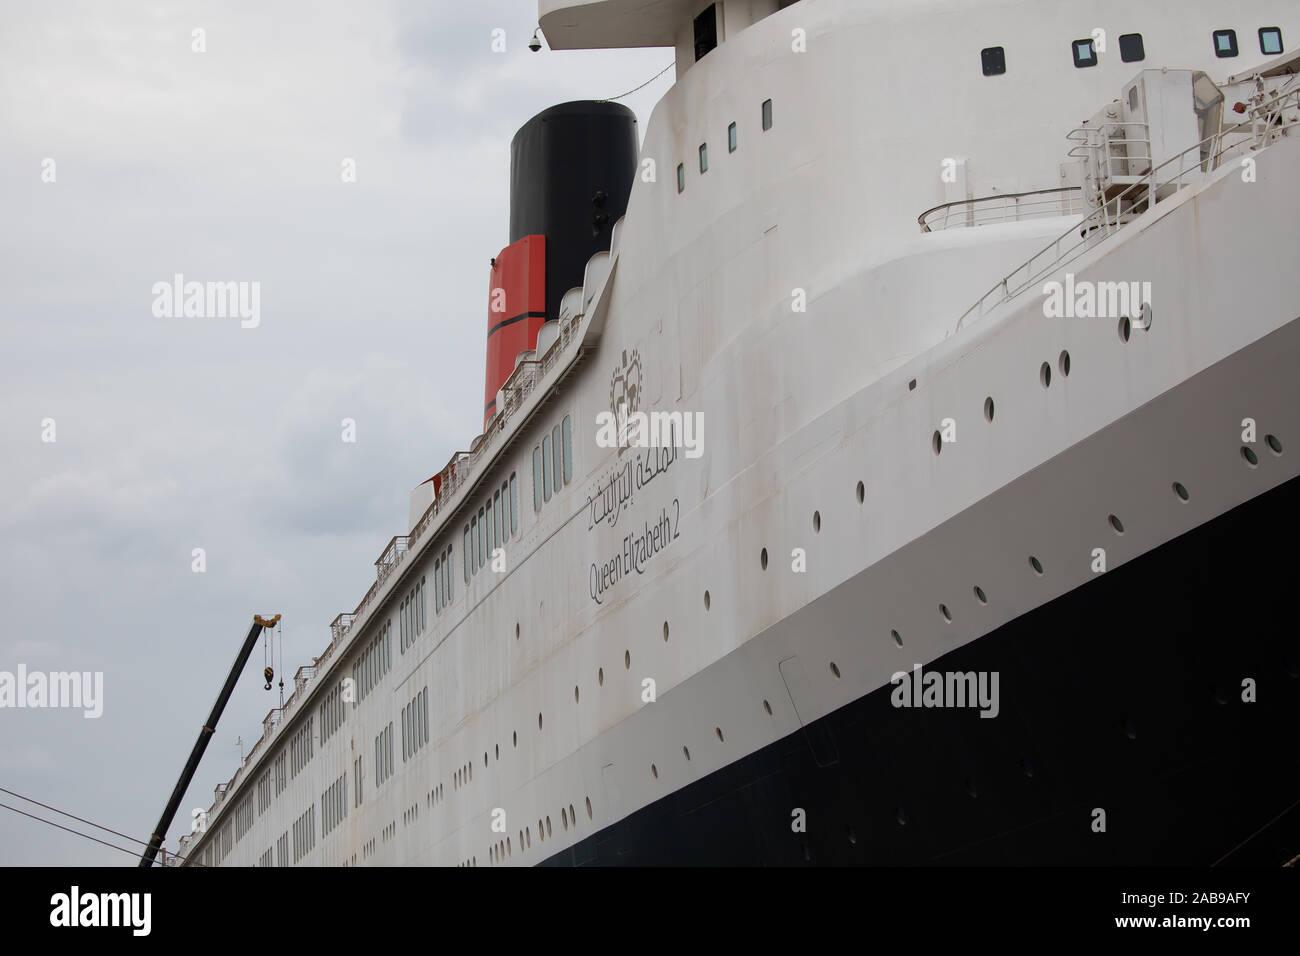 Queen Elizabeth 2 Docked In Dubai Uae Is Now A Floating Hotel Stock Photo Alamy